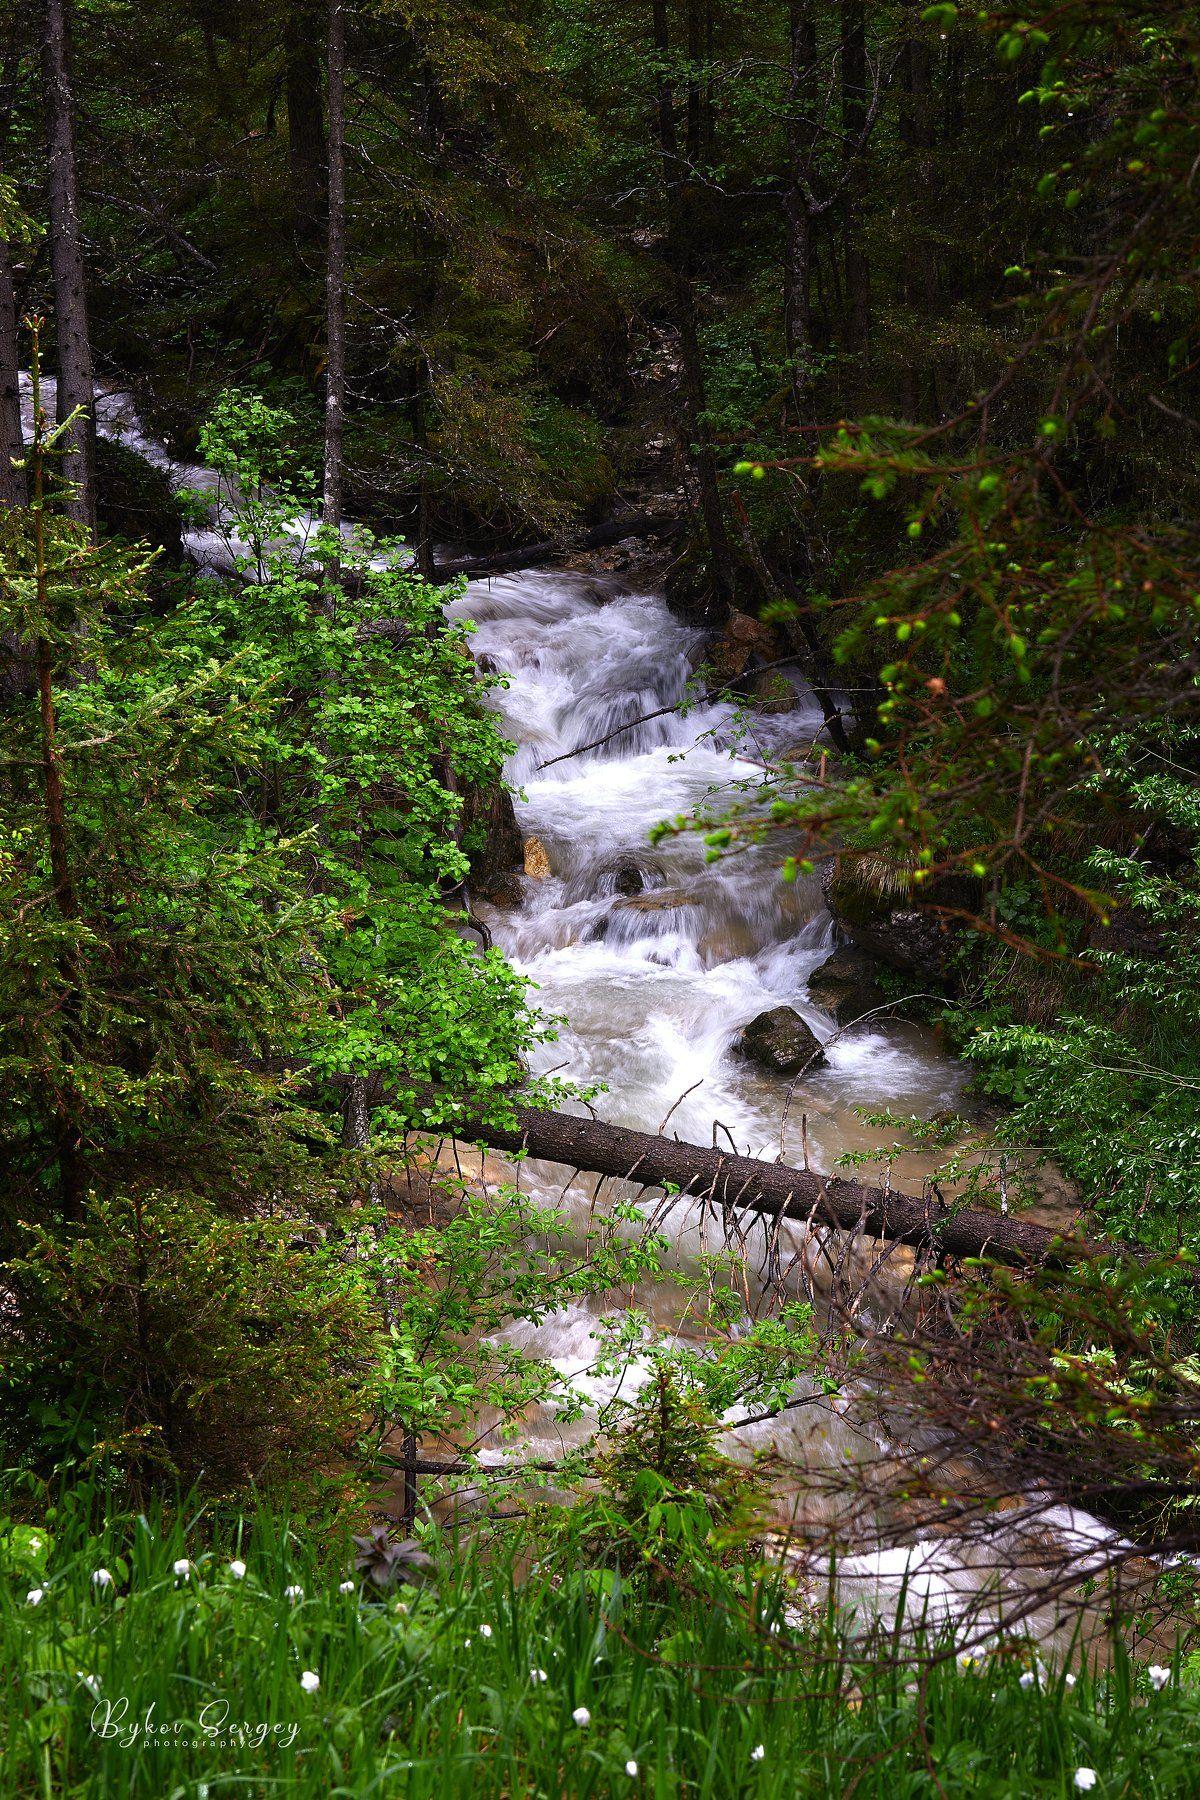 dolomiti, dolomites, photography, mood, blue, silence, rocks, cluouds, alps, wbpa, nature, beautiful, stunning, landscape, wood, Быков Сергей